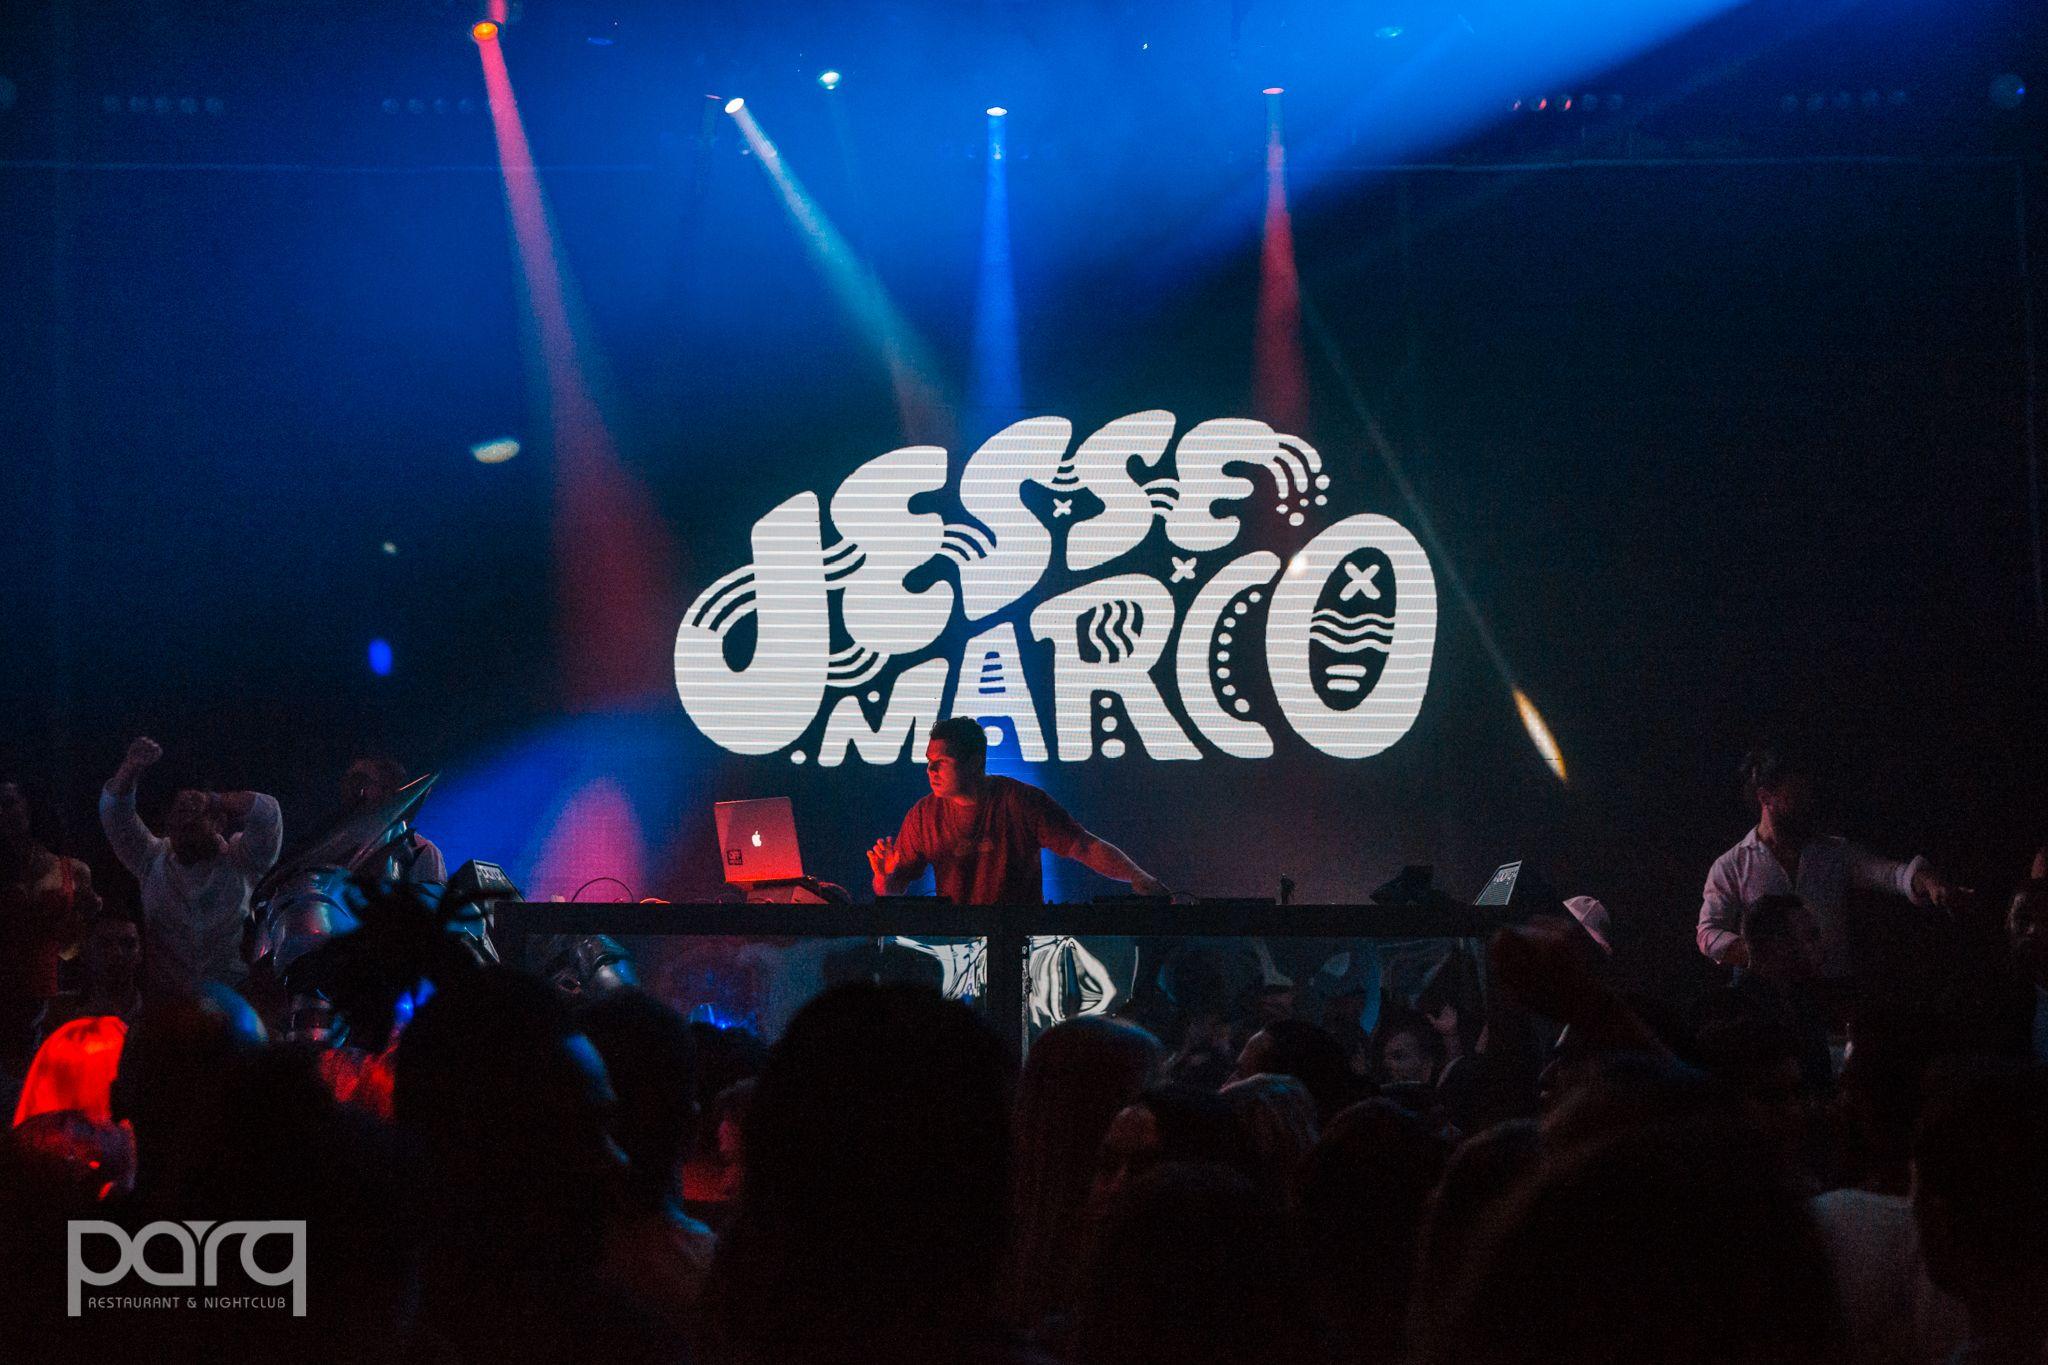 08.18.18 Parq - Jesse Marco-1.jpg